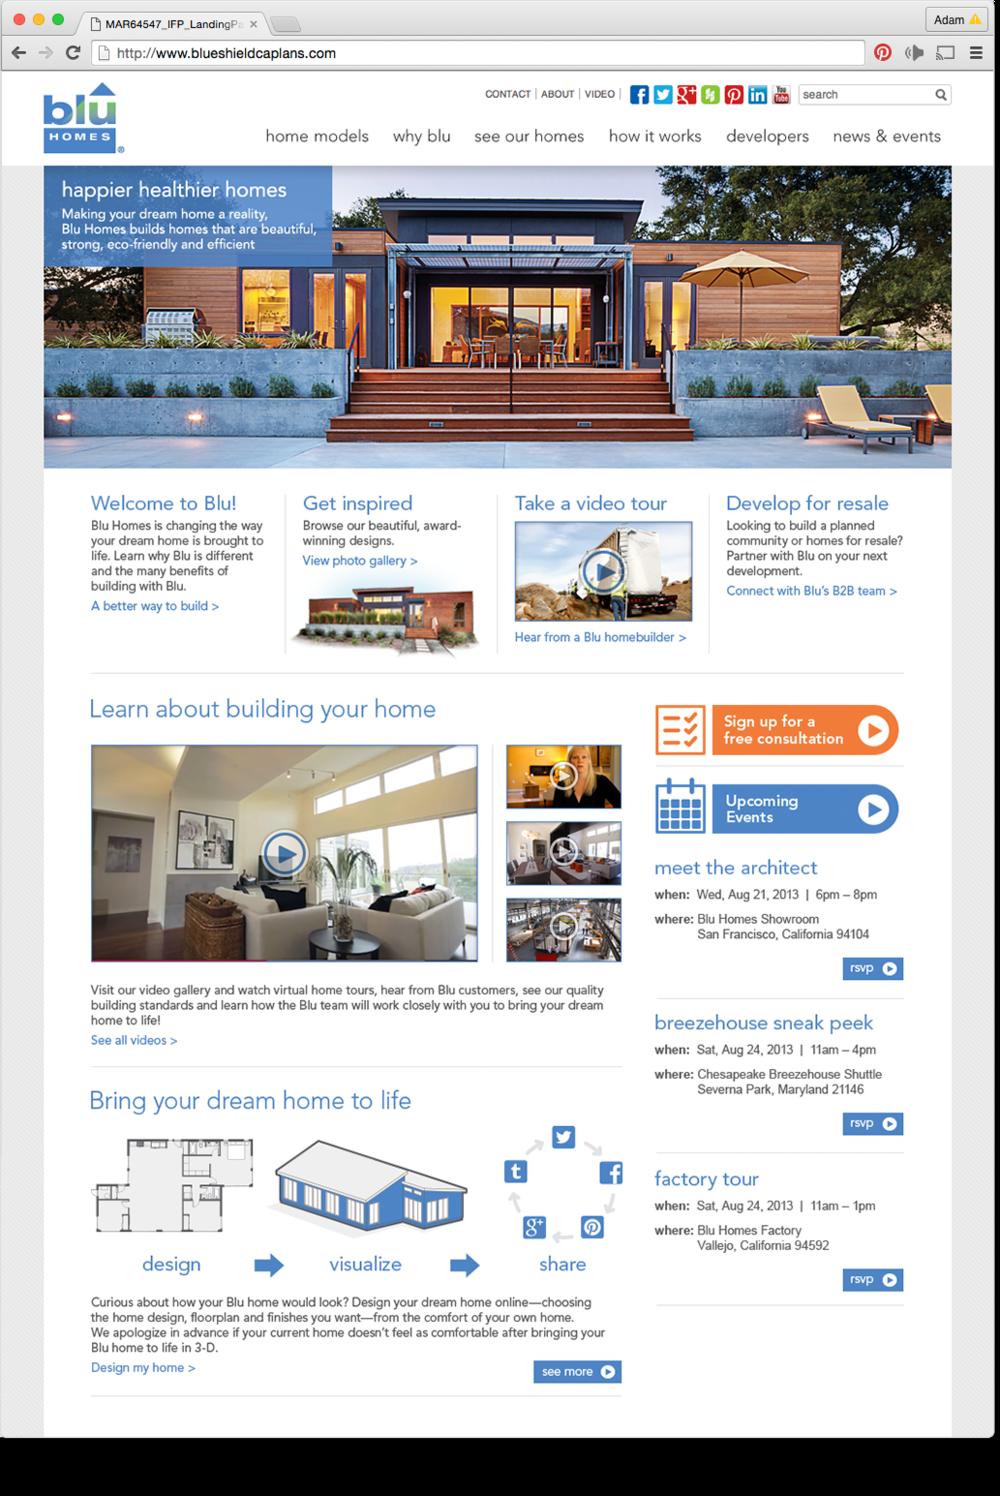 BluHomes_Homepage_1033x1545_1.png